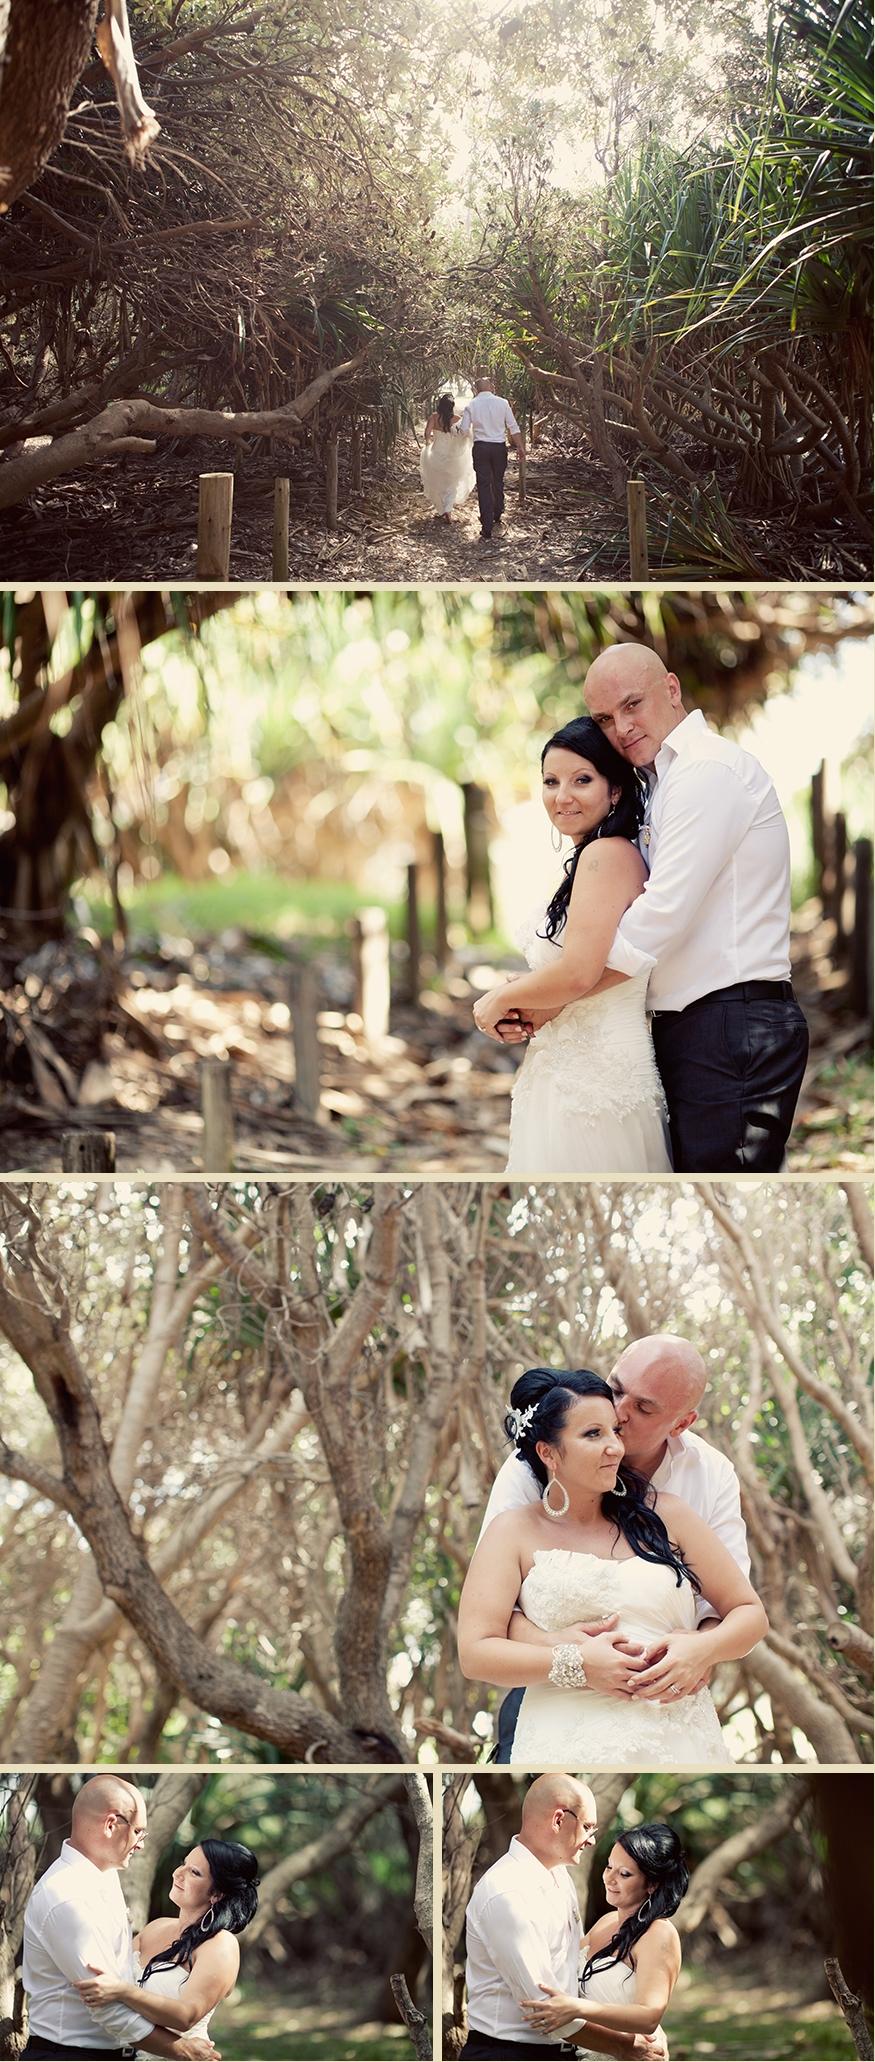 Brisbane Wedding Phoographer Blog collage-1329891994791